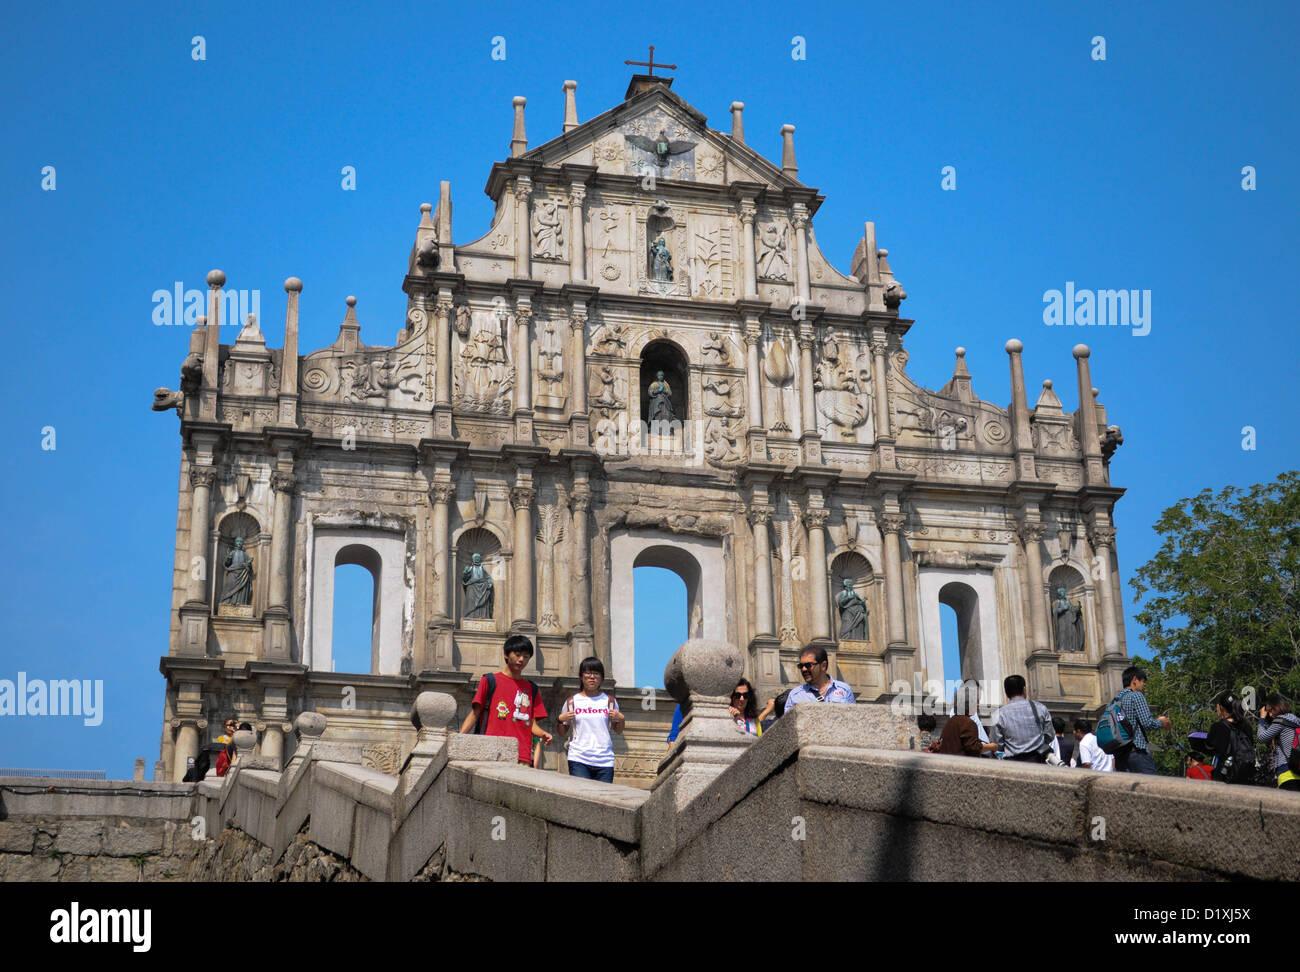 Ruines de St Paul, l'icône de Macao Photo Stock